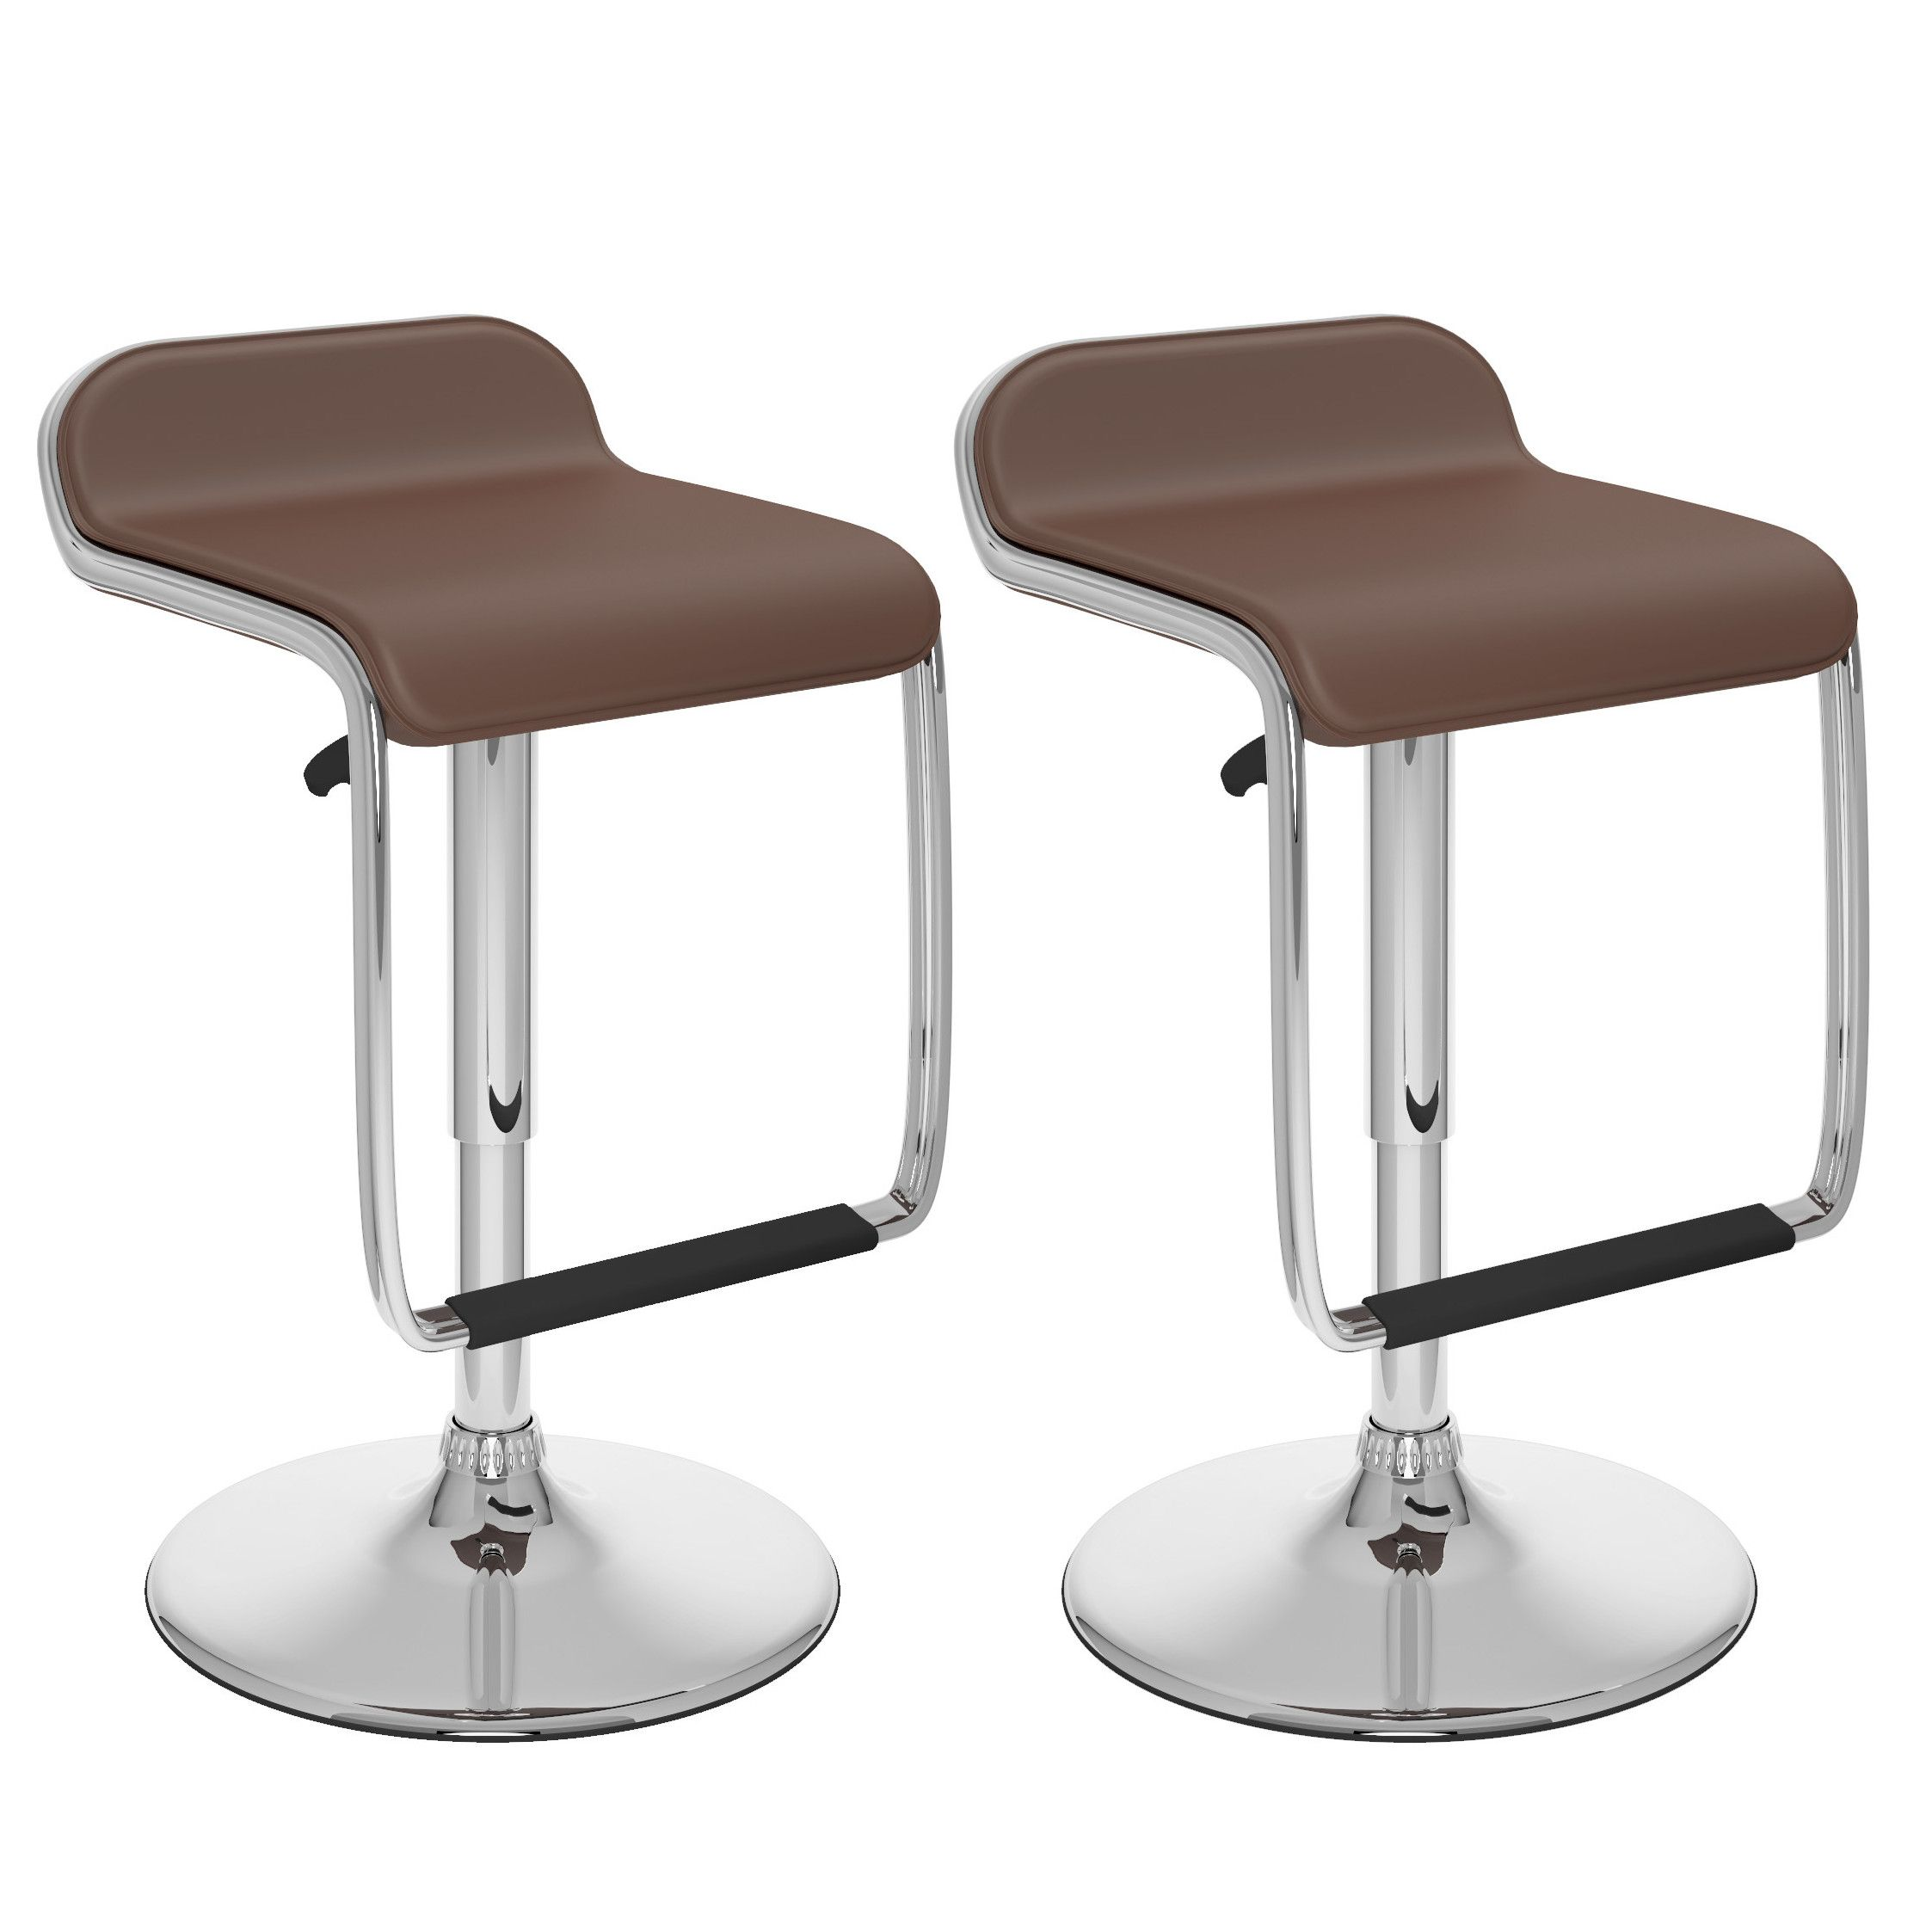 dcor design adjustable height swivel bar stool. dcor design adjustable height swivel bar stool  furniture